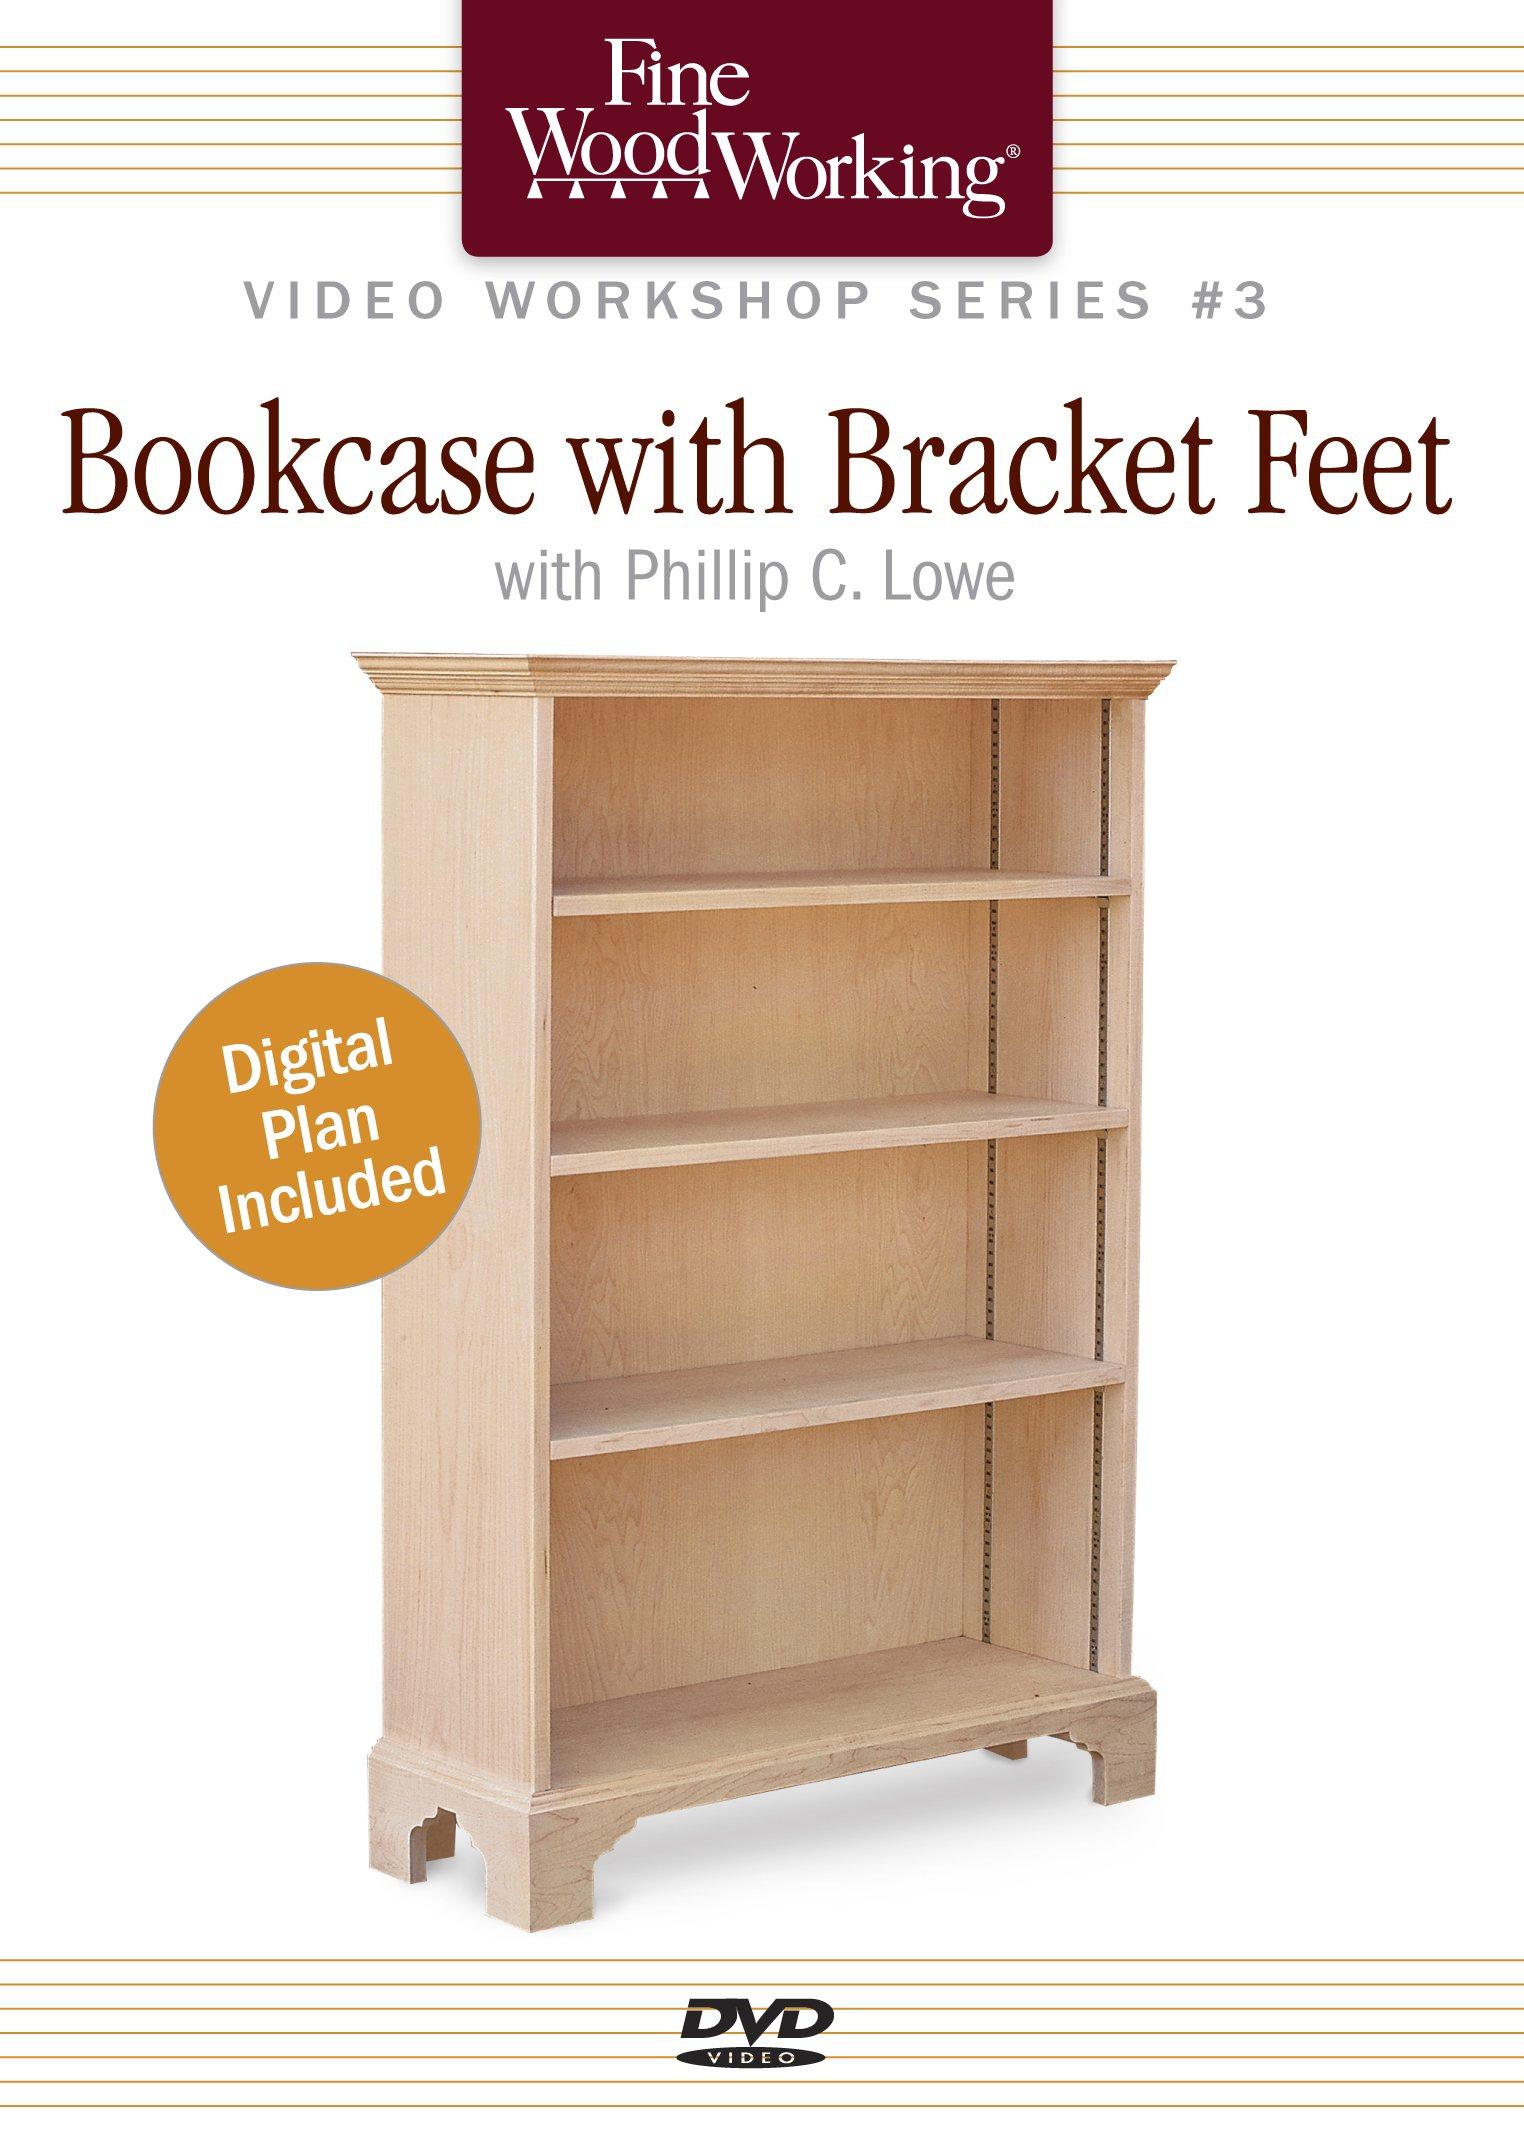 Fine Woodworking Video Workshop Series - Bookcase with Bracket Feet